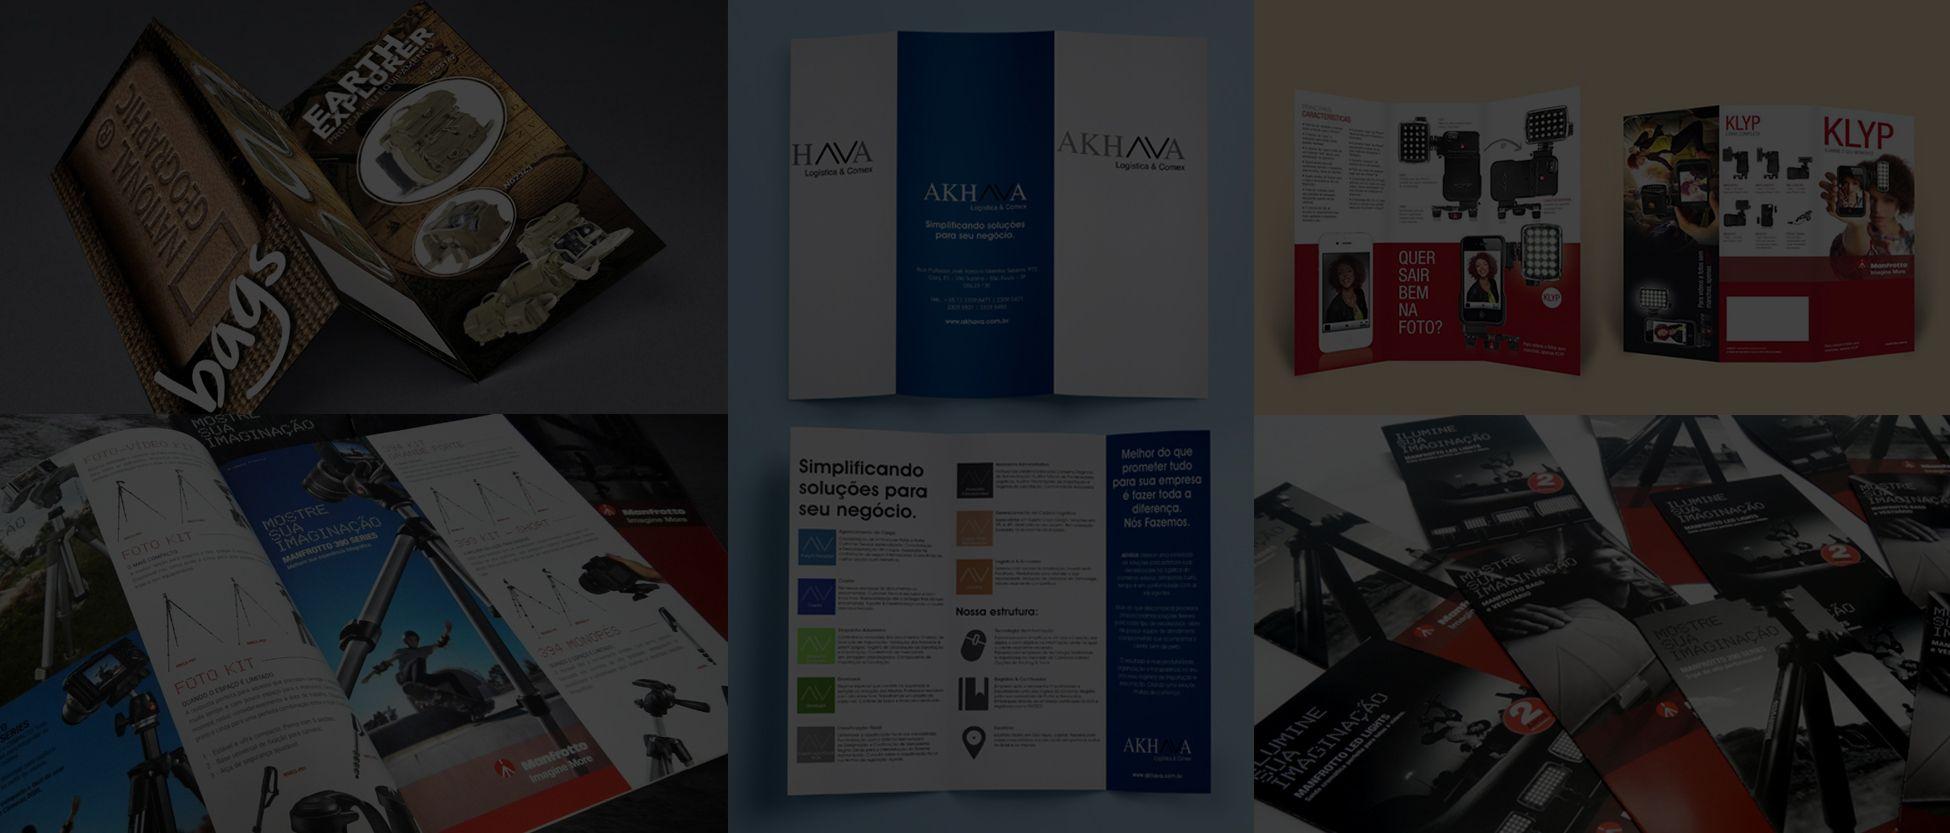 catalogo-folder-flyer-material-de-apoio-cabeca-criativa-comunicacao-agencia-de-publicidade